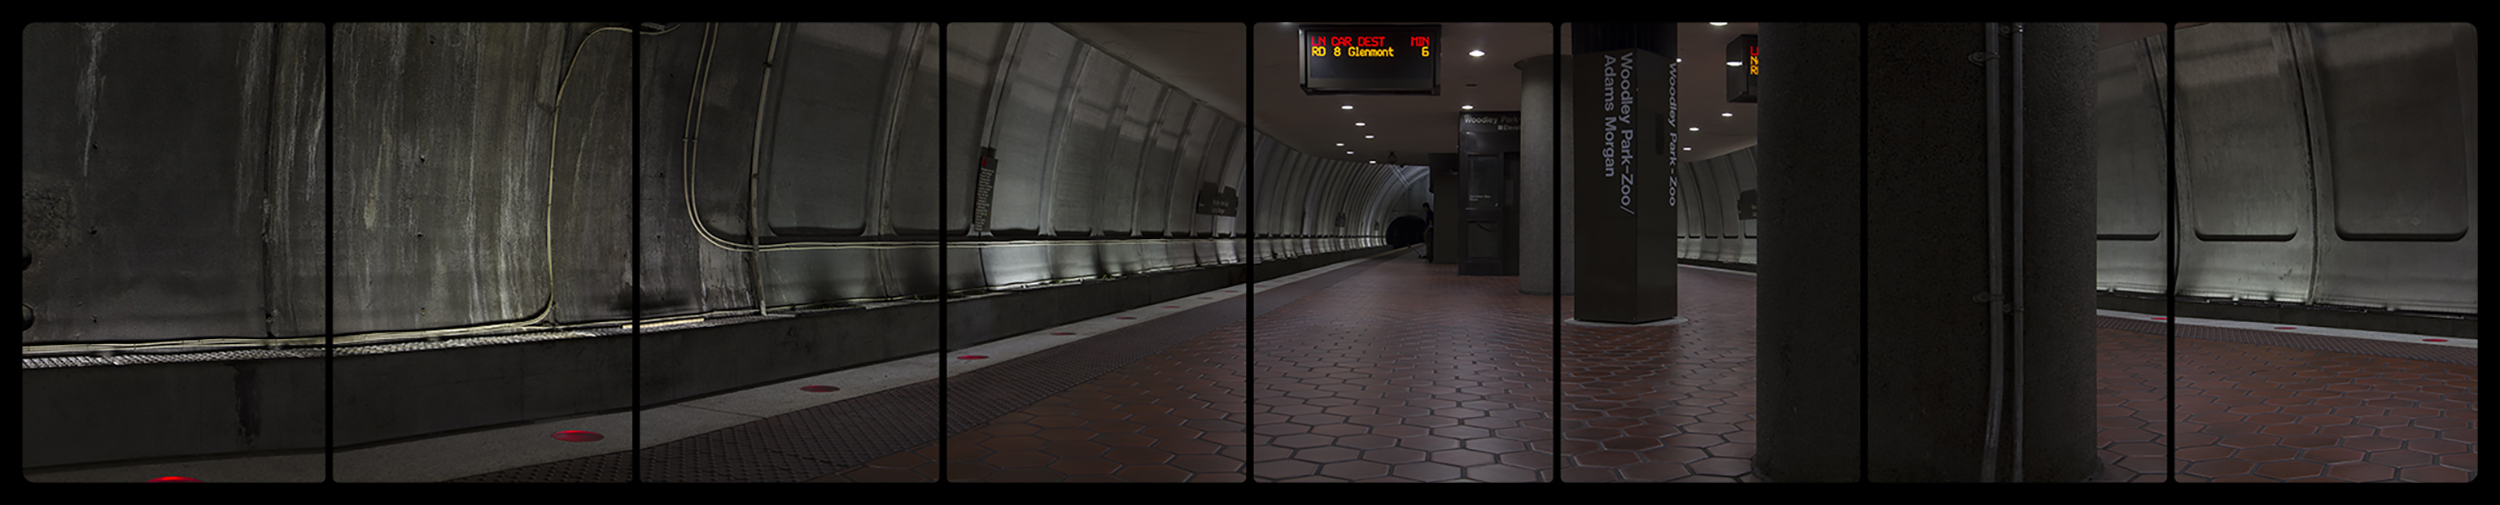 Metro Rail, Woodley Park-Zoo,6-15-2014,2677-2685